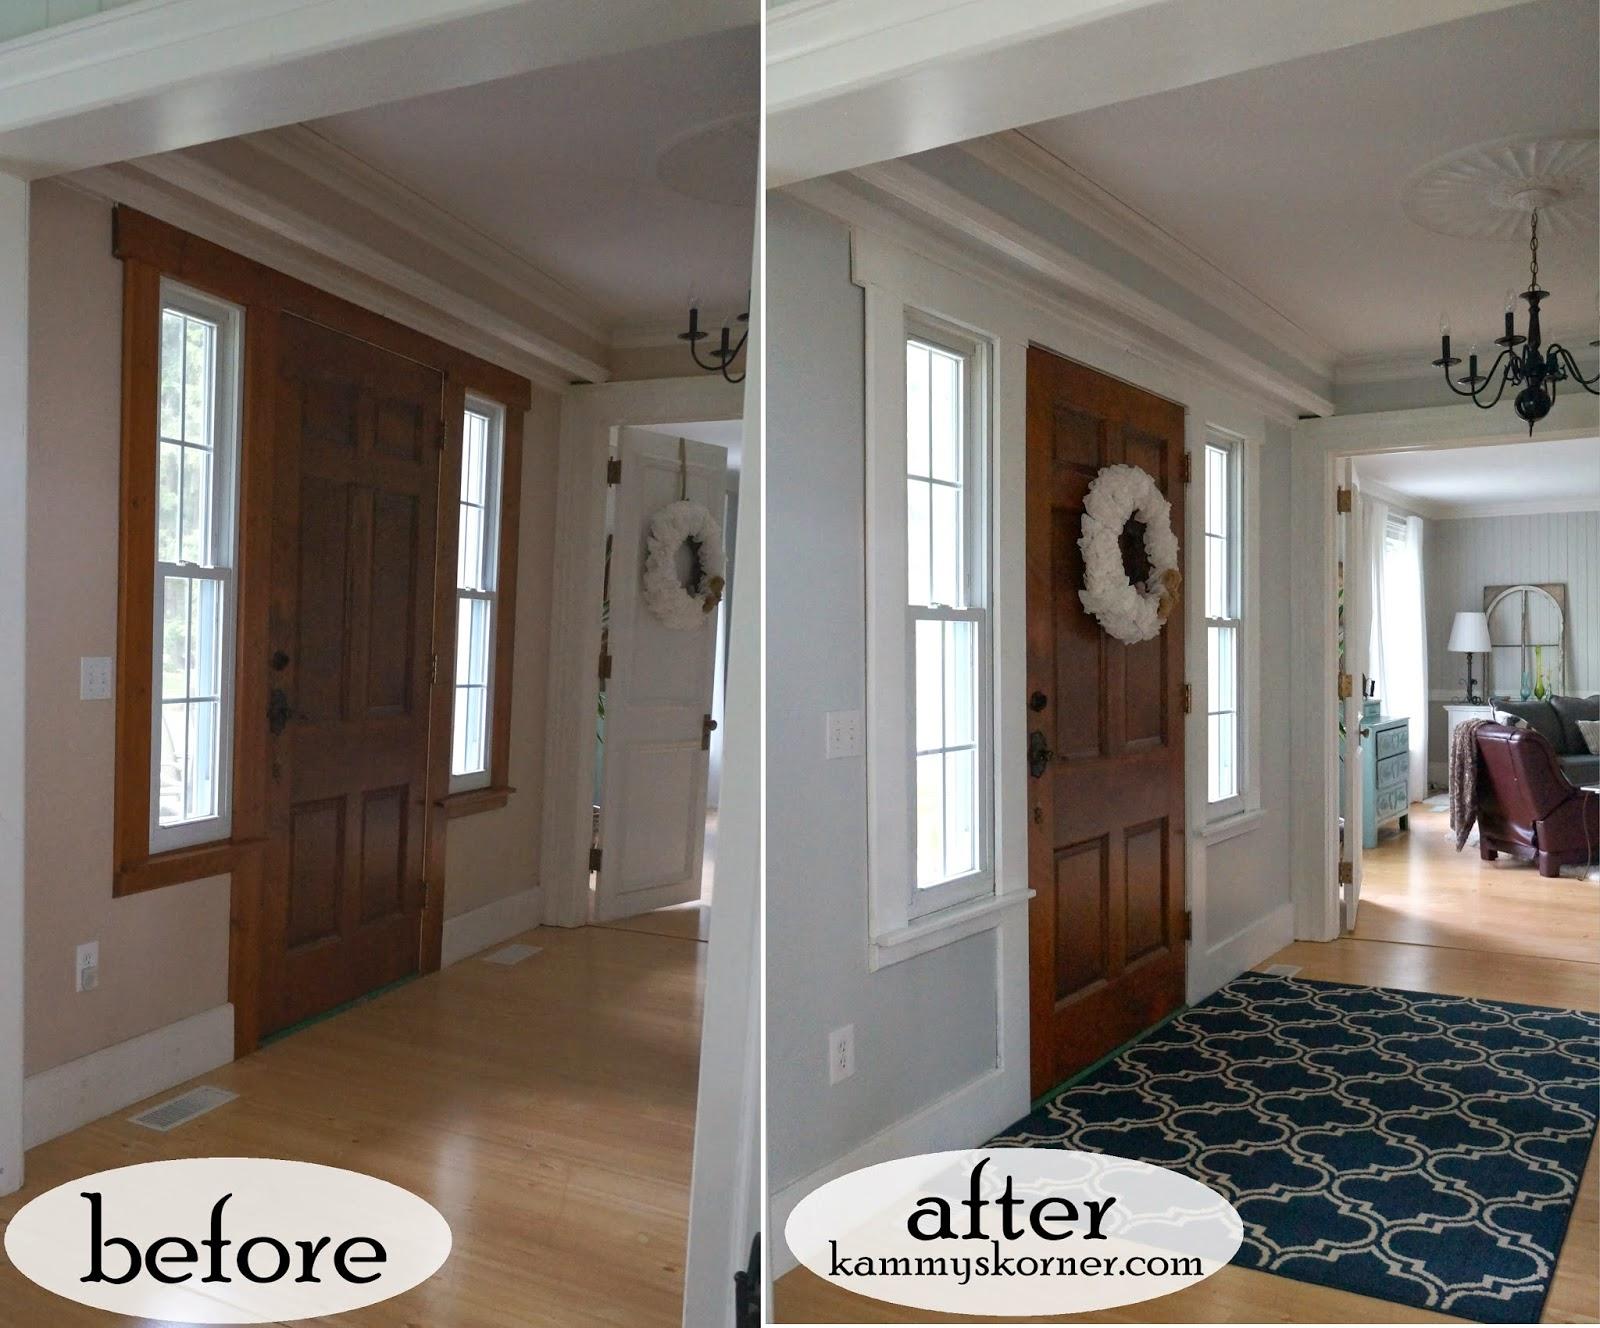 Kammy S Korner Updating The Foyer 10 Paint Interior Wood Trim White Great